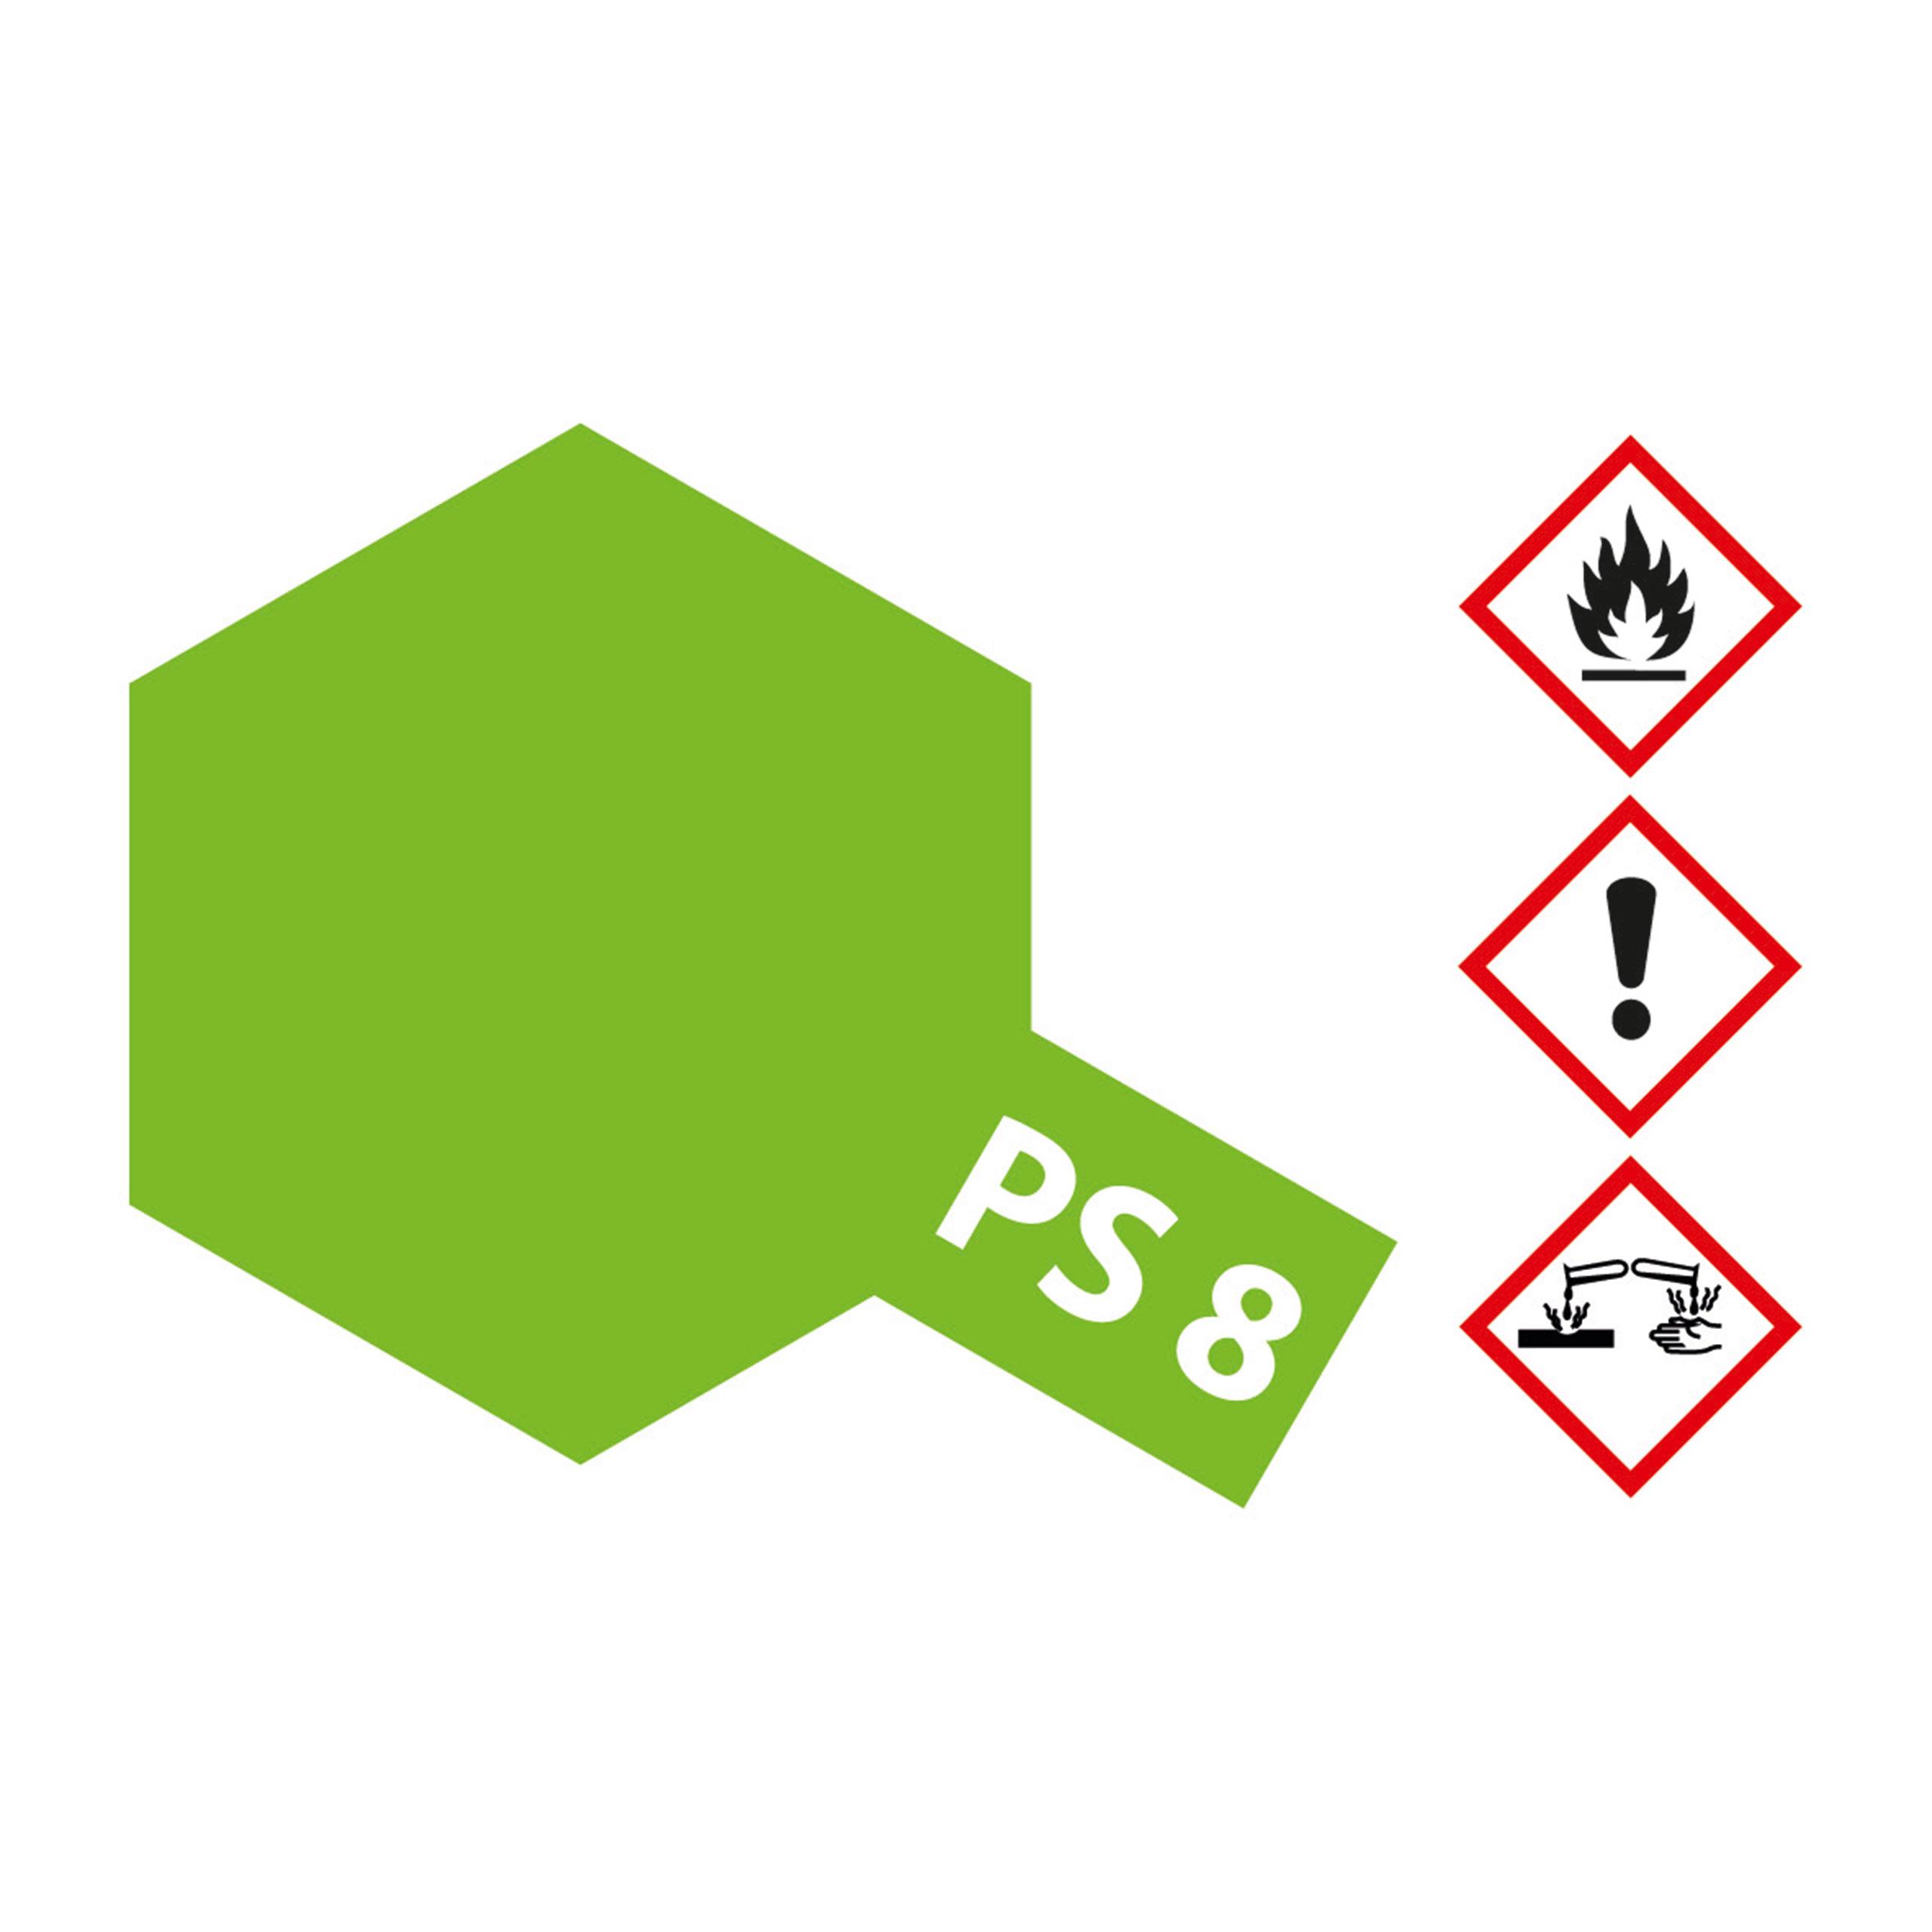 PS-8 Hellgruen Polycarbonat - 100ml Sprayfarbe Lexan - Tamiya 300086008